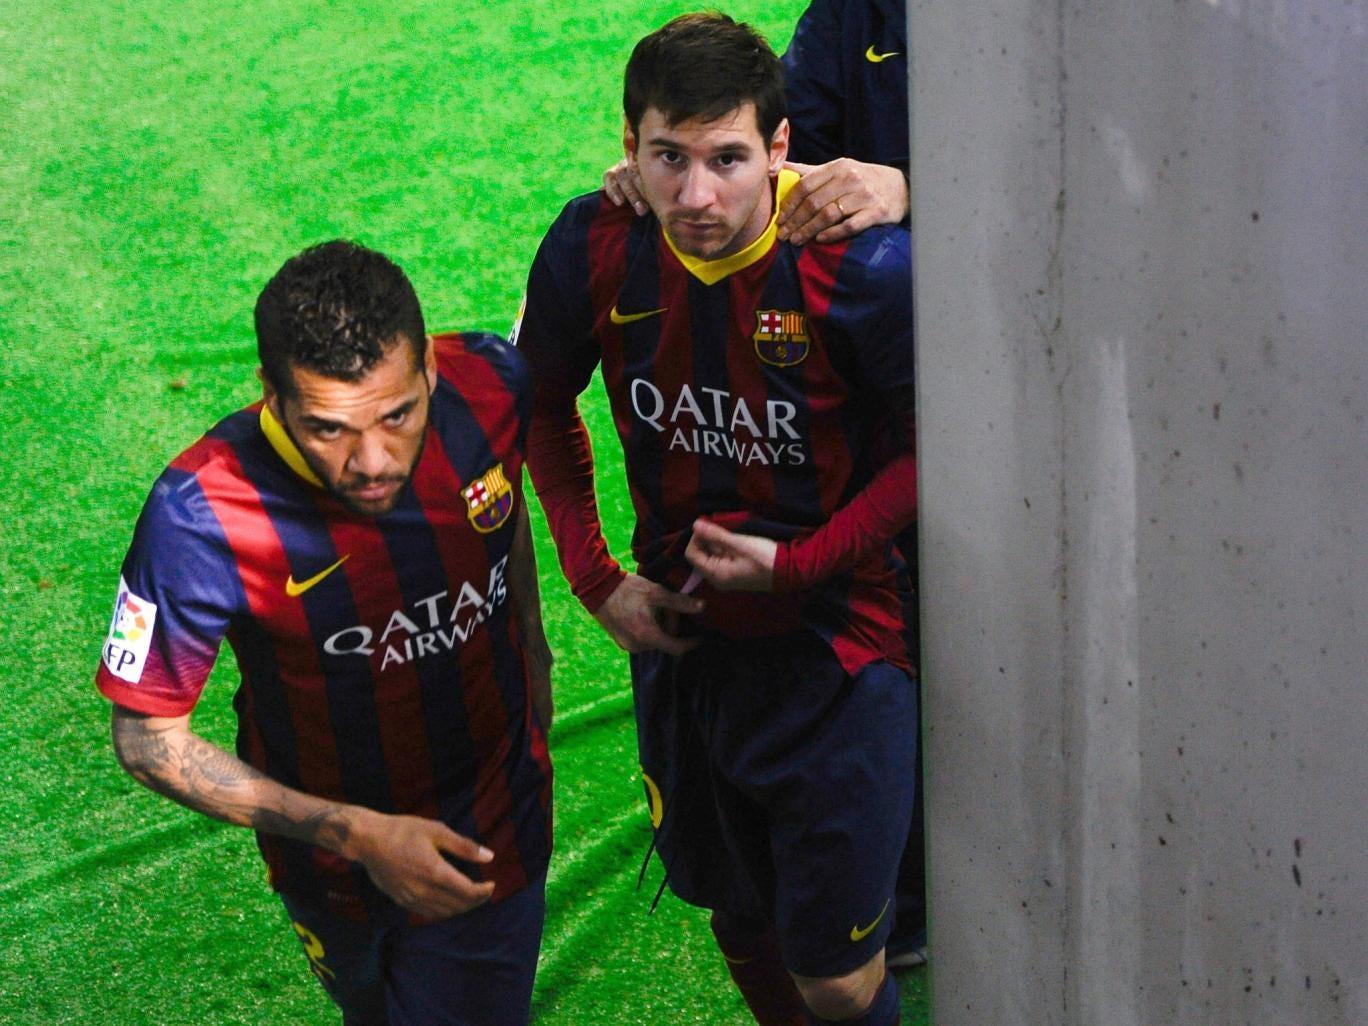 Lionel Messi and his teammate Dani Alves of FC Barcelona leave the locker room area prior to the Copa del Rey semi final second leg against Real Sociedad